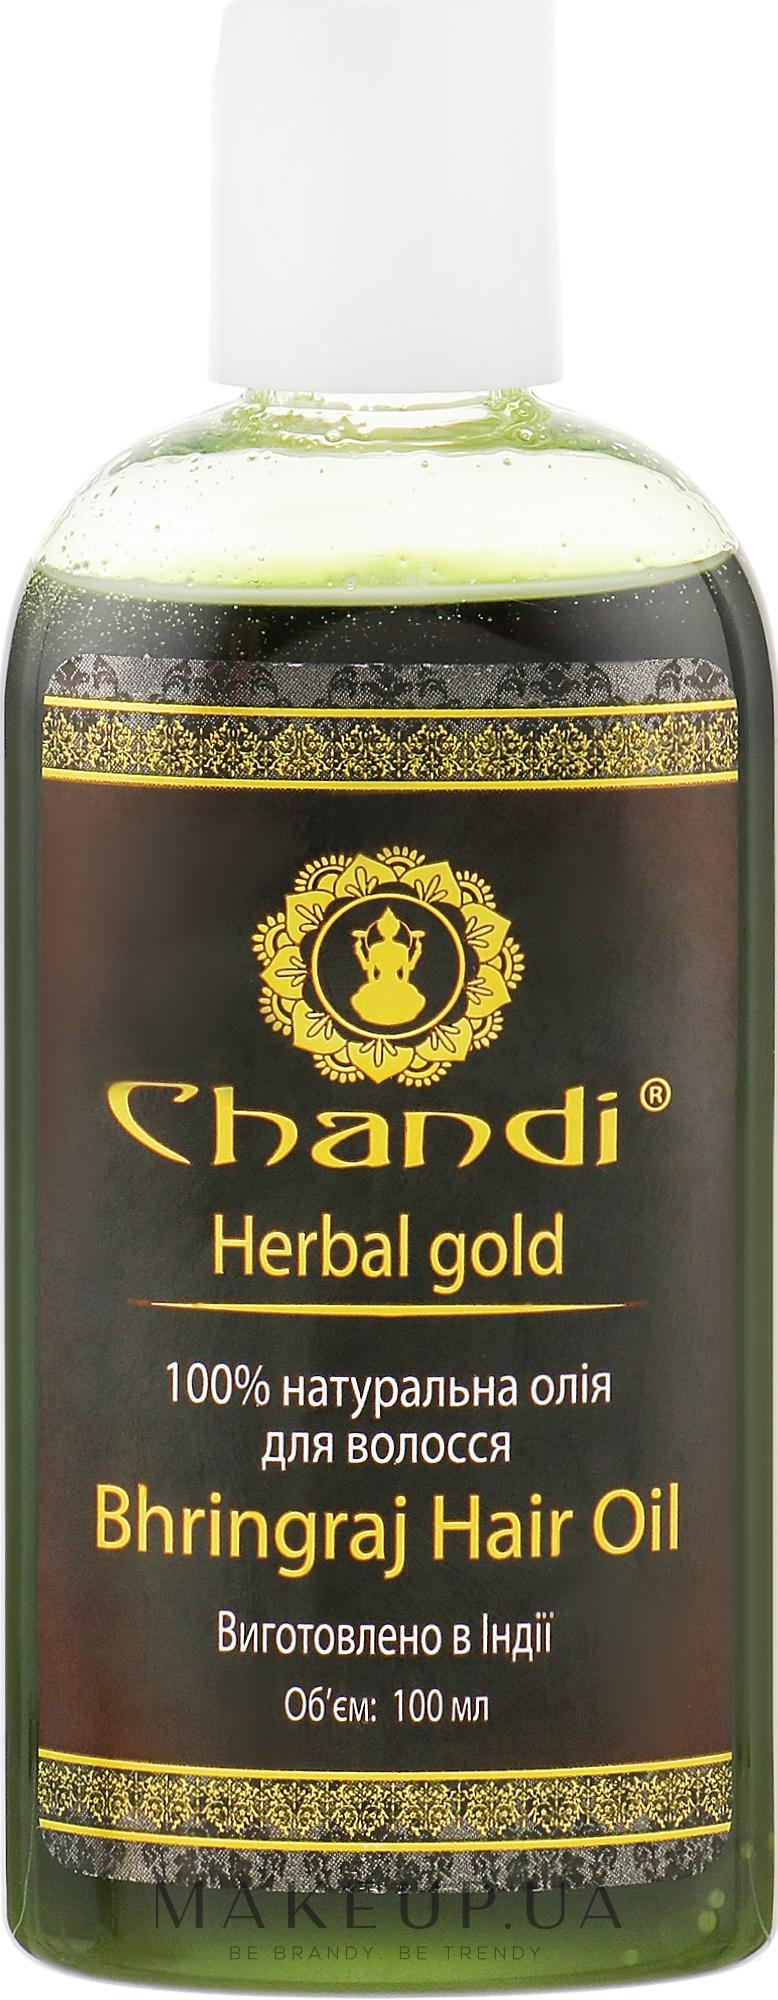 Натуральне масло для волосся - Chandi Bhringraj Hair Oil — фото 100ml